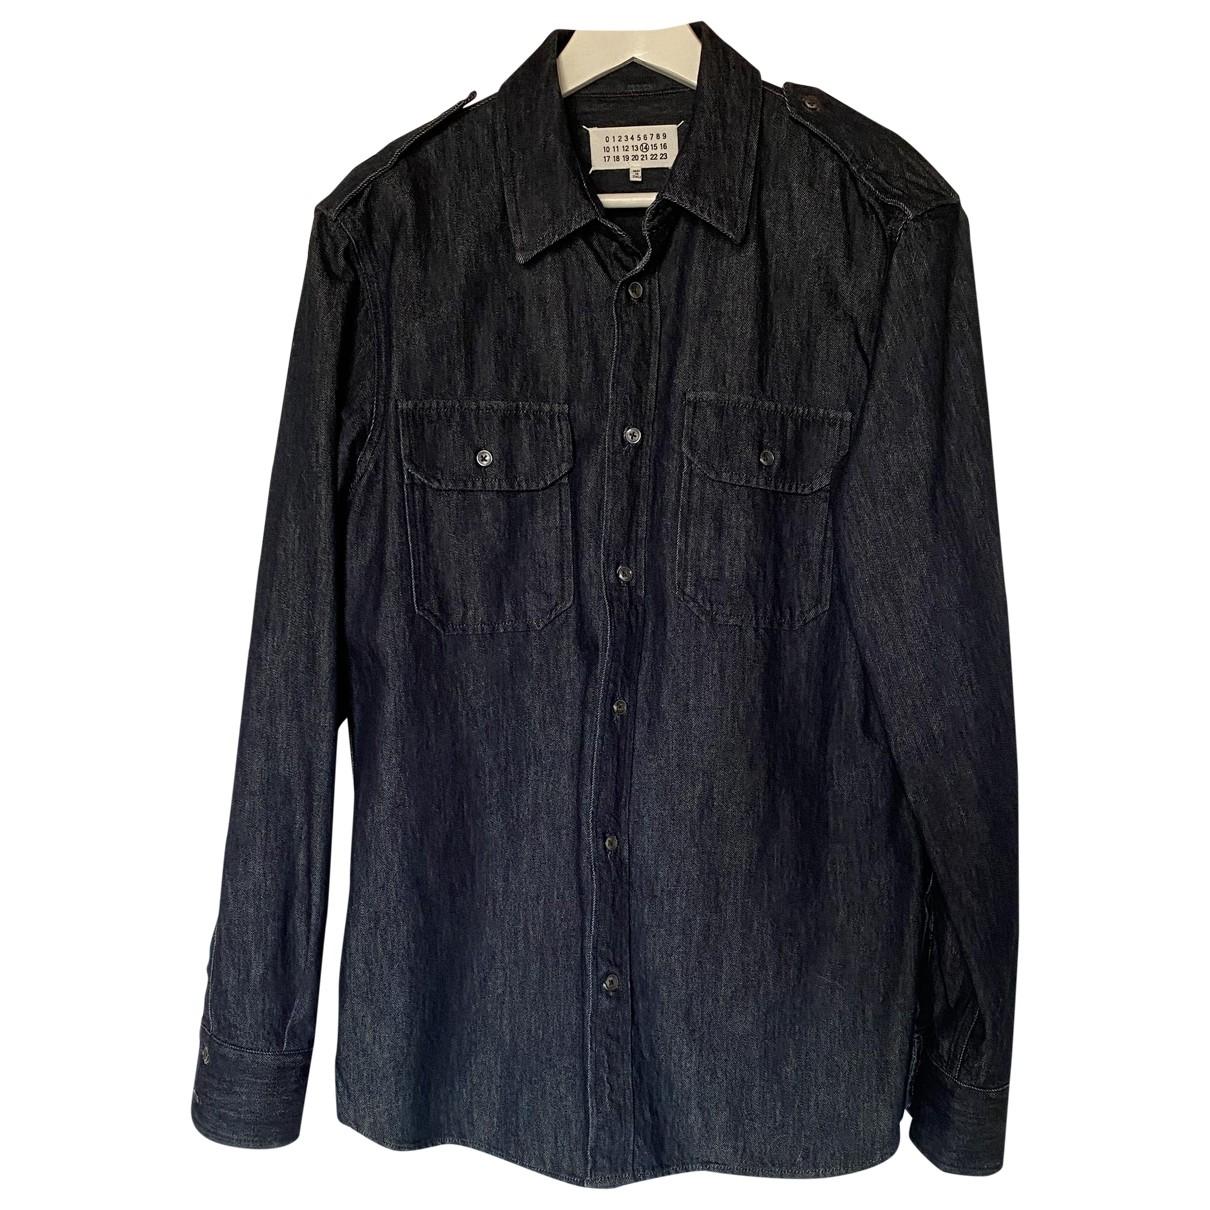 Maison Martin Margiela \N Navy Denim - Jeans Shirts for Men 44 EU (tour de cou / collar)